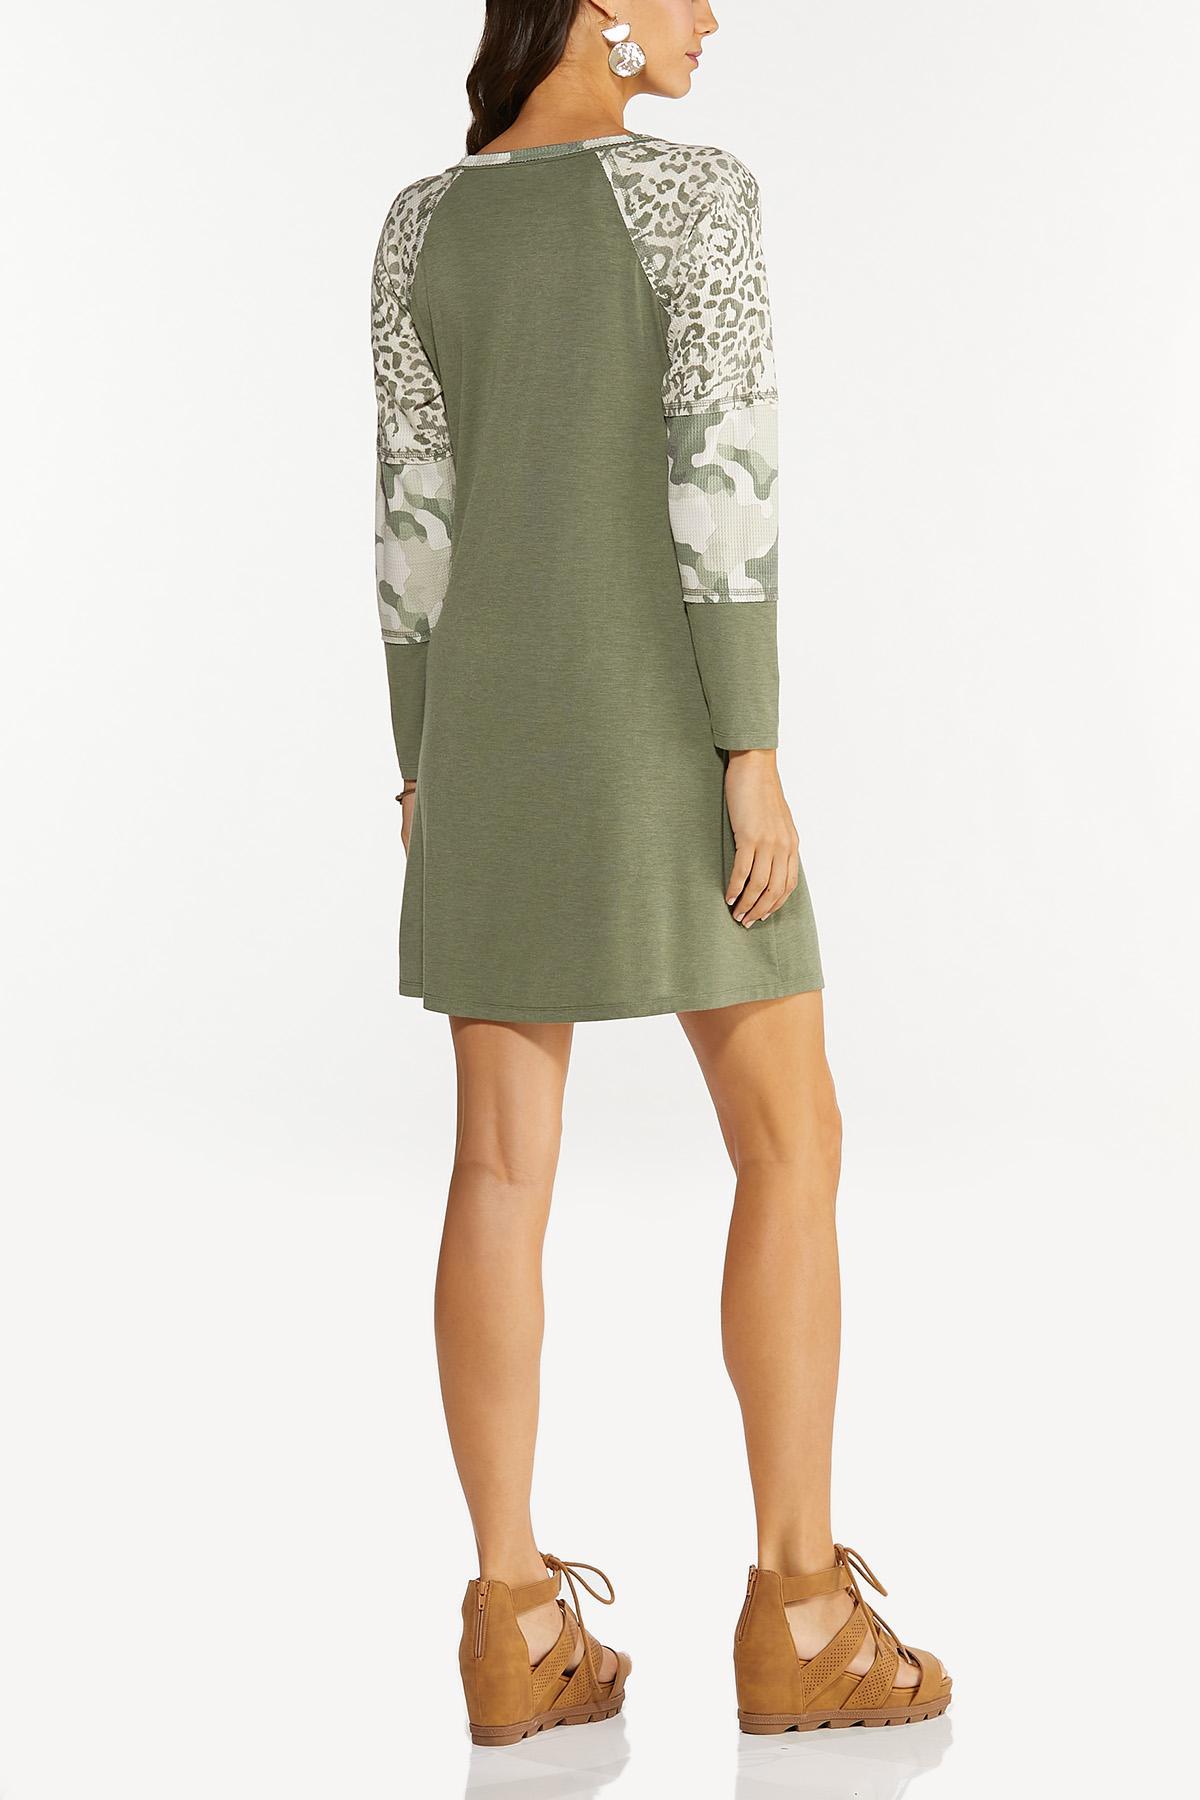 Animal Sleeve Shift Dress (Item #44677900)